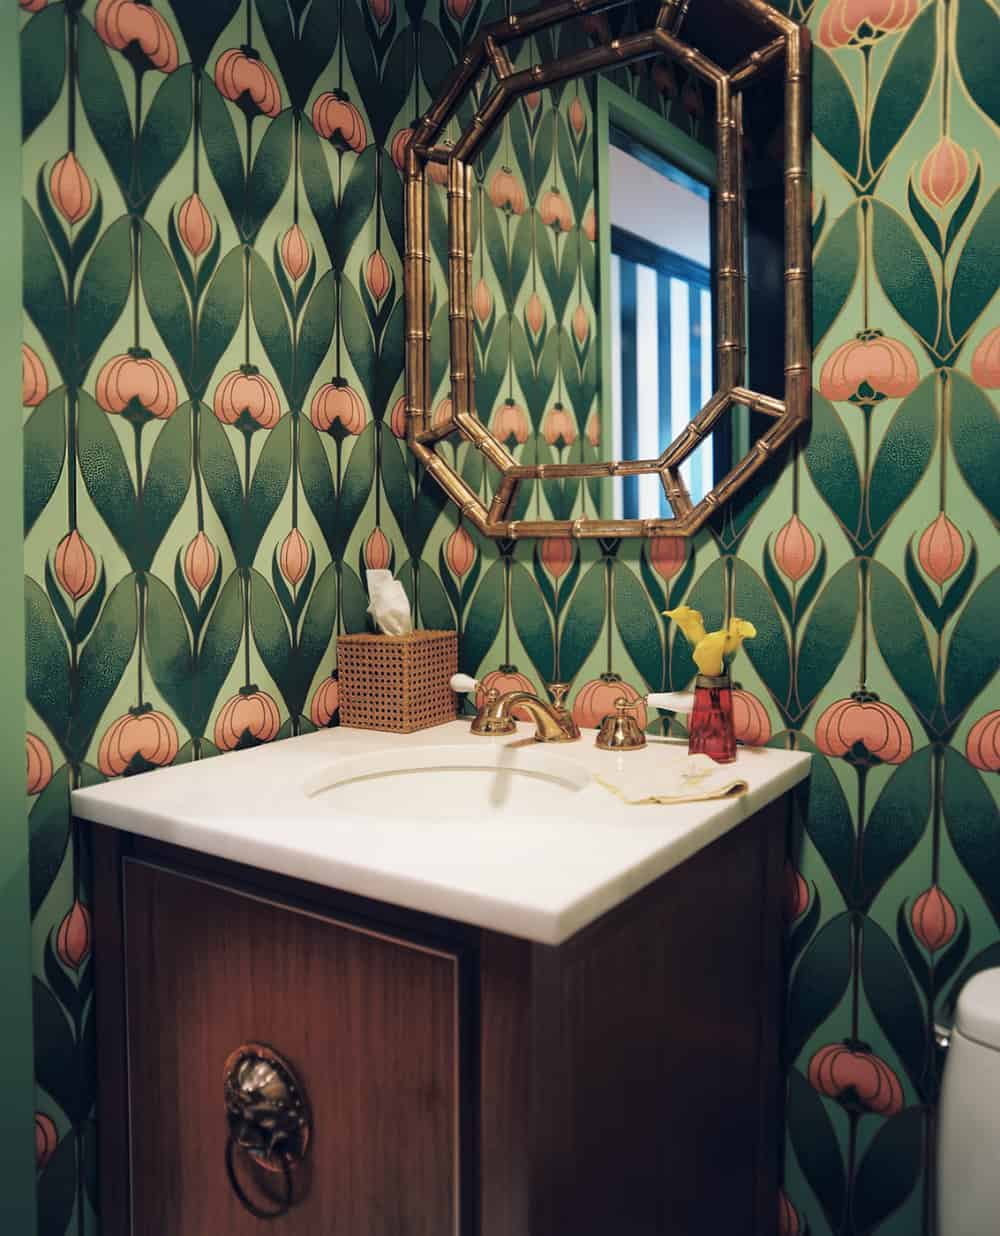 Powder room with retro wallpaper